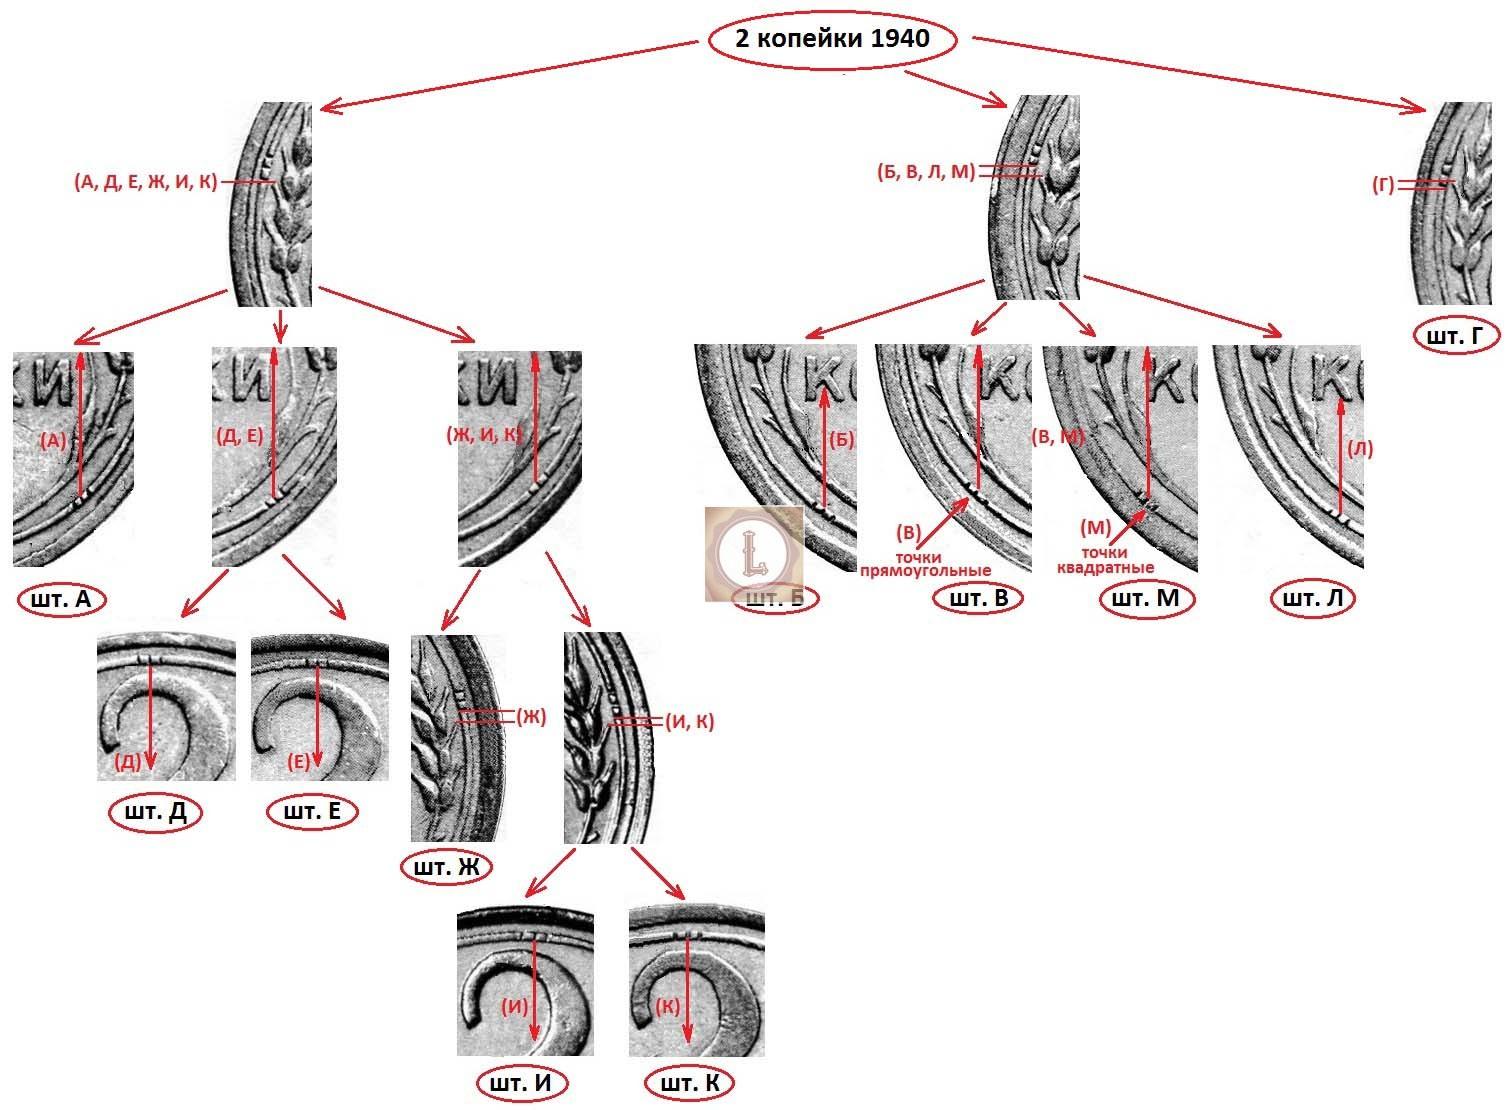 Алгоритм идентификации по методу А. И. Широкова